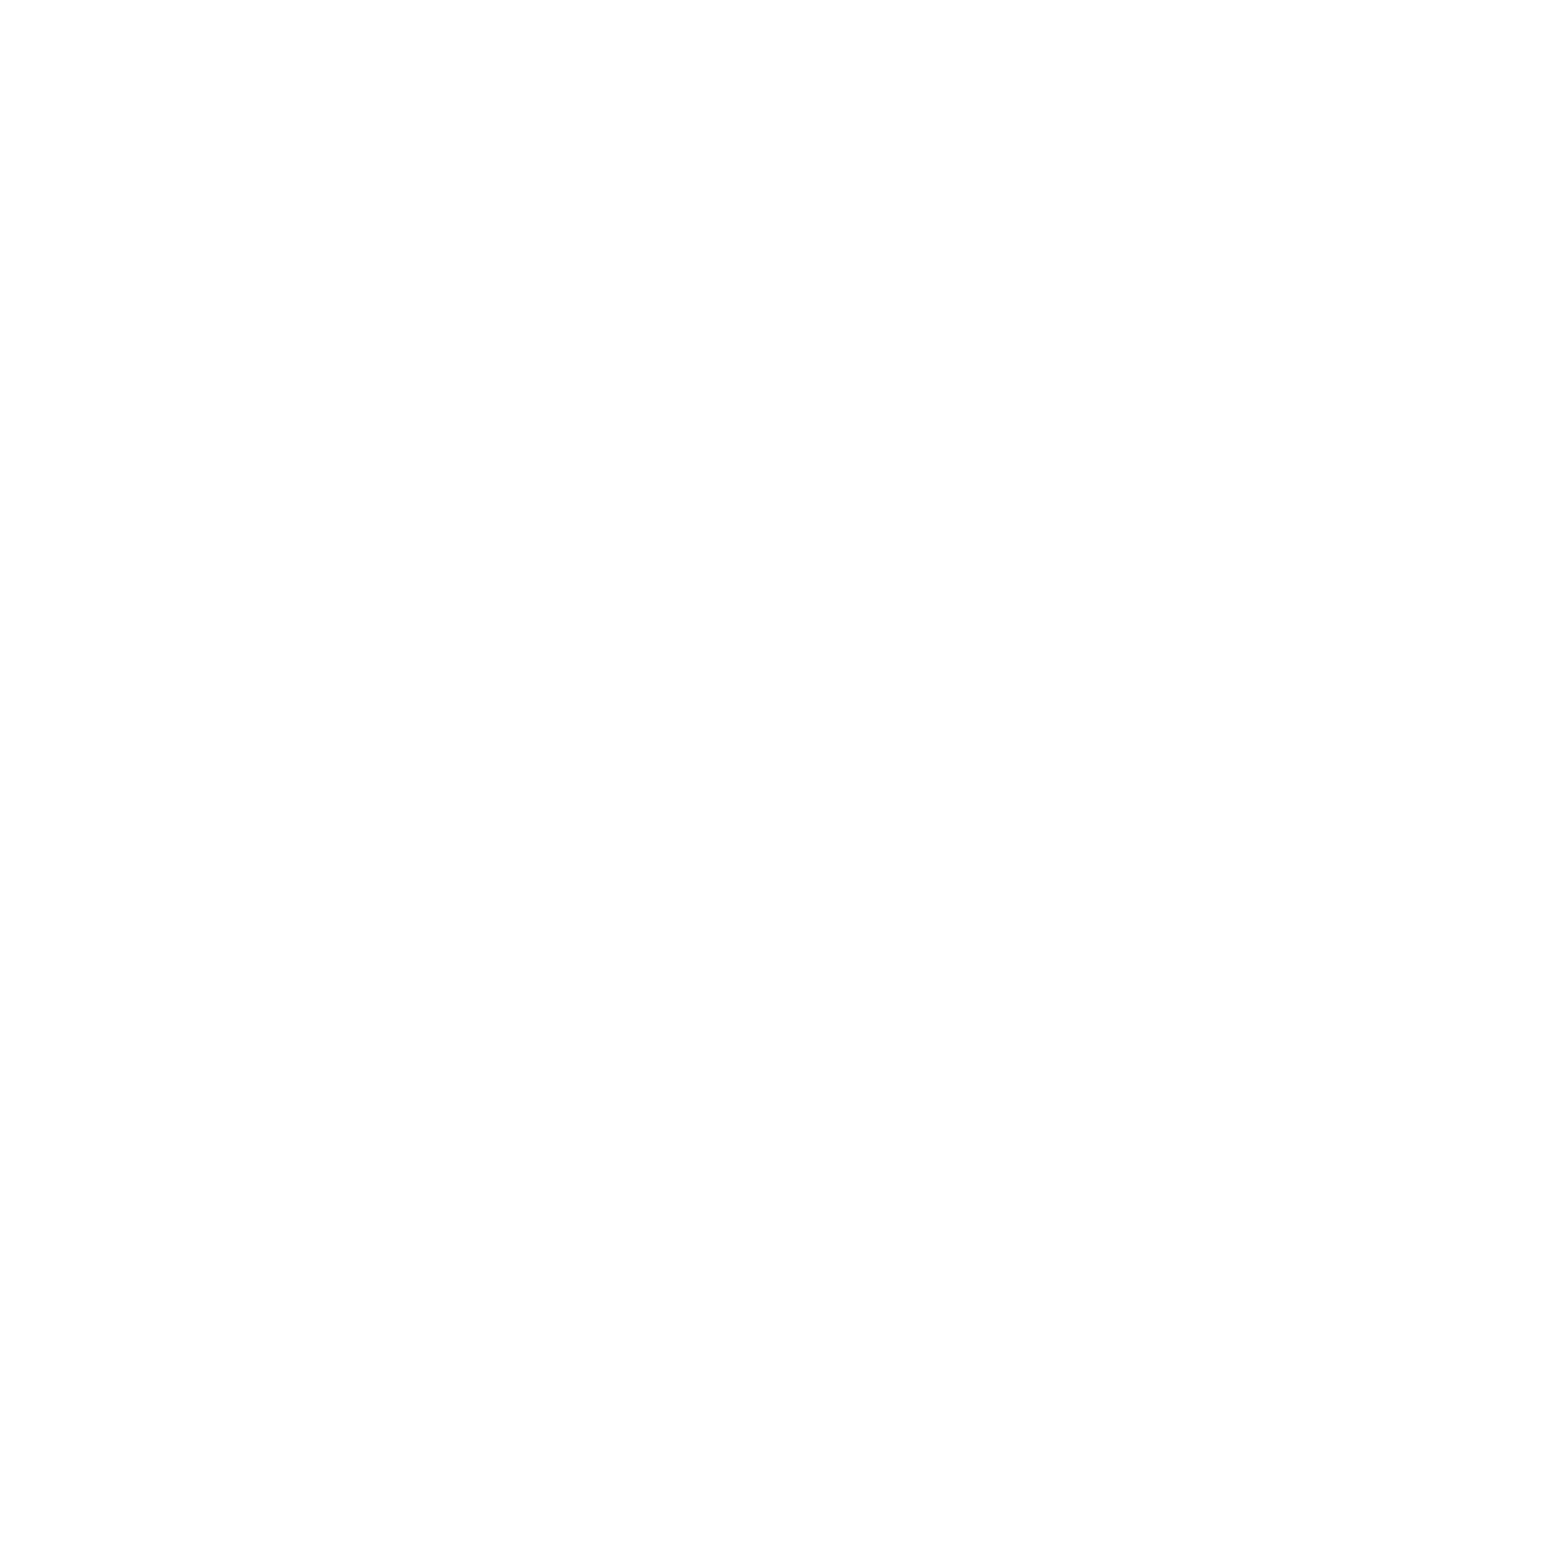 Workshop icone - User journey